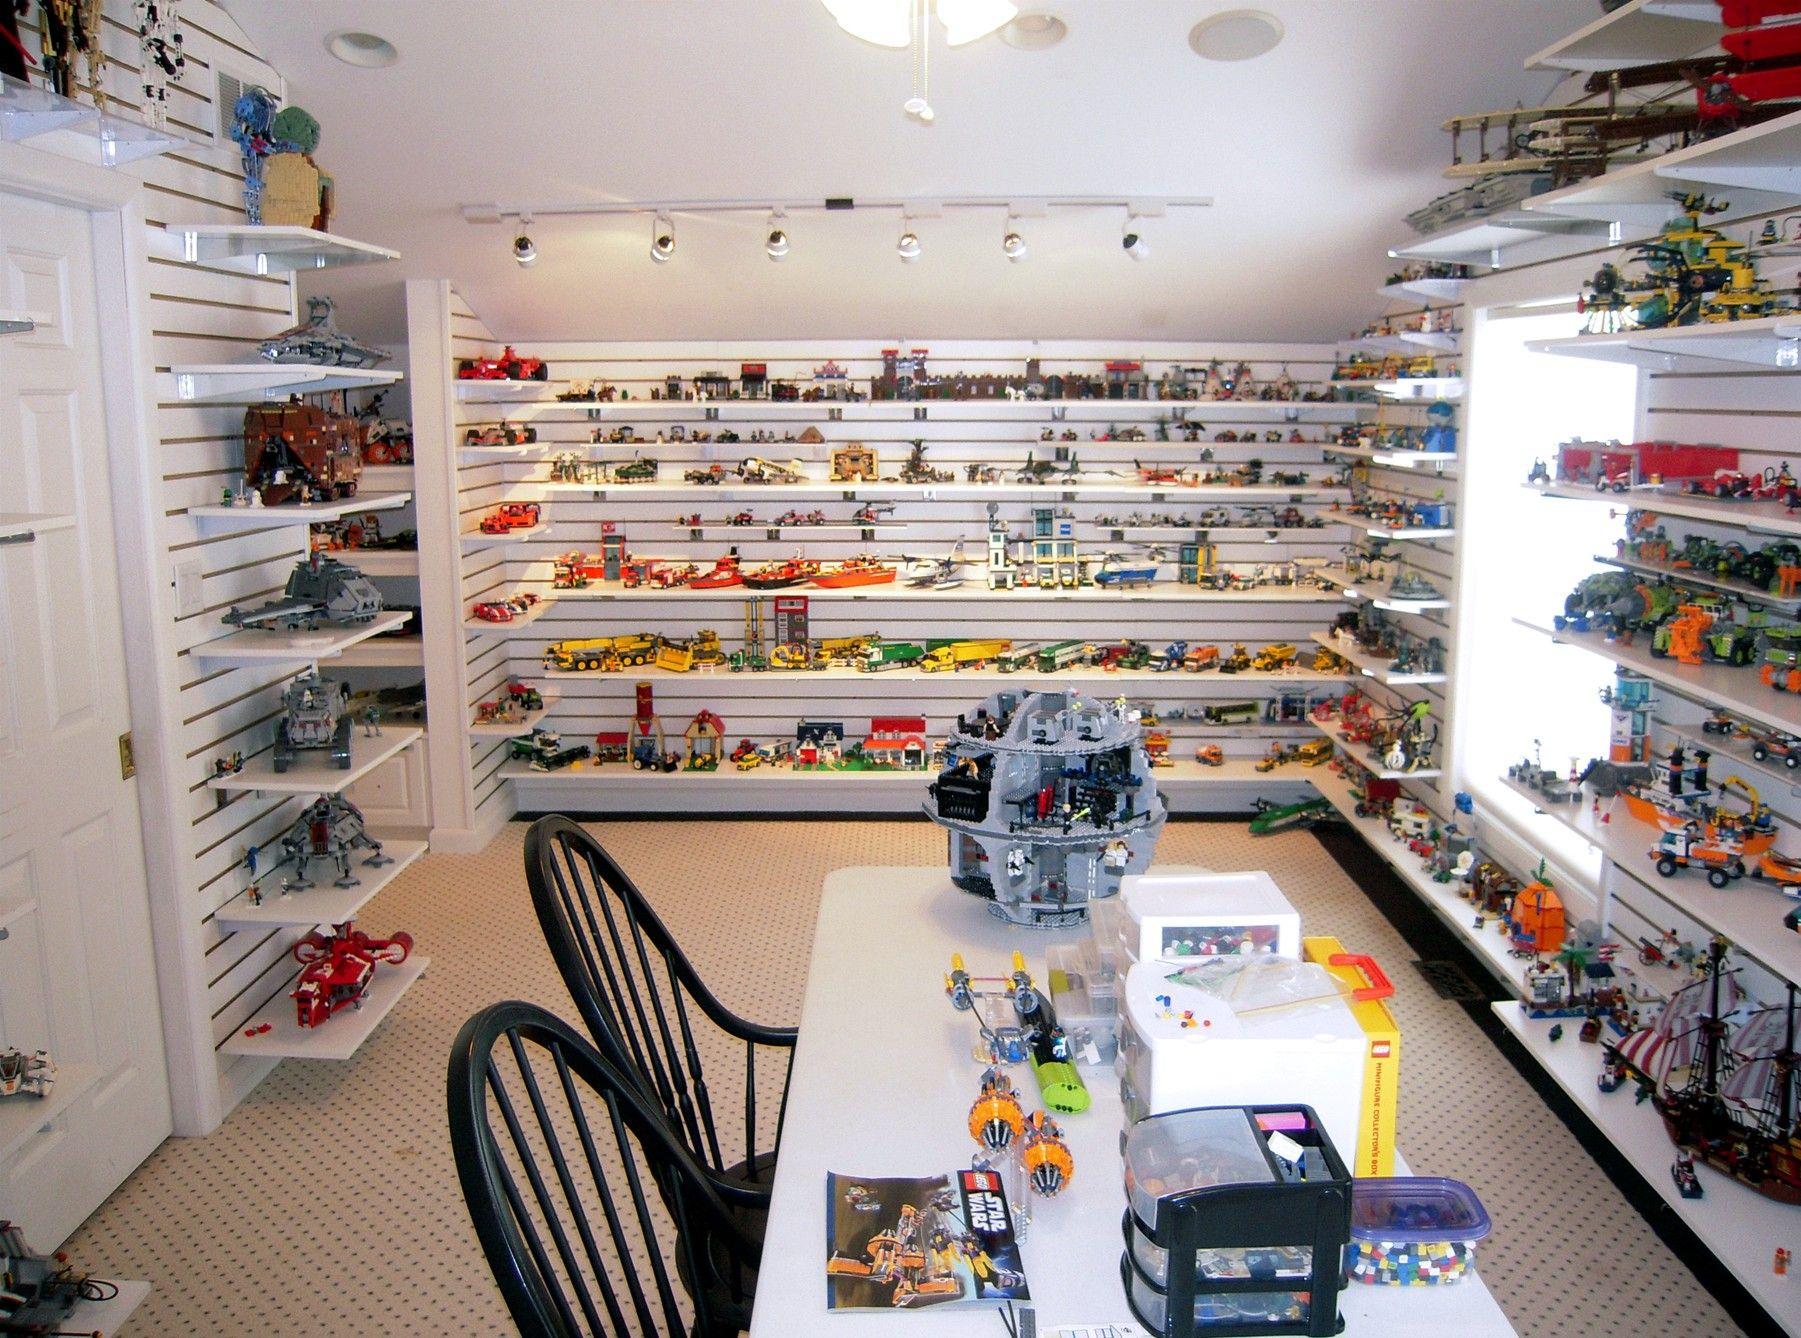 Lego Room Google Search Lego Room Lego Room Decor Lego Display